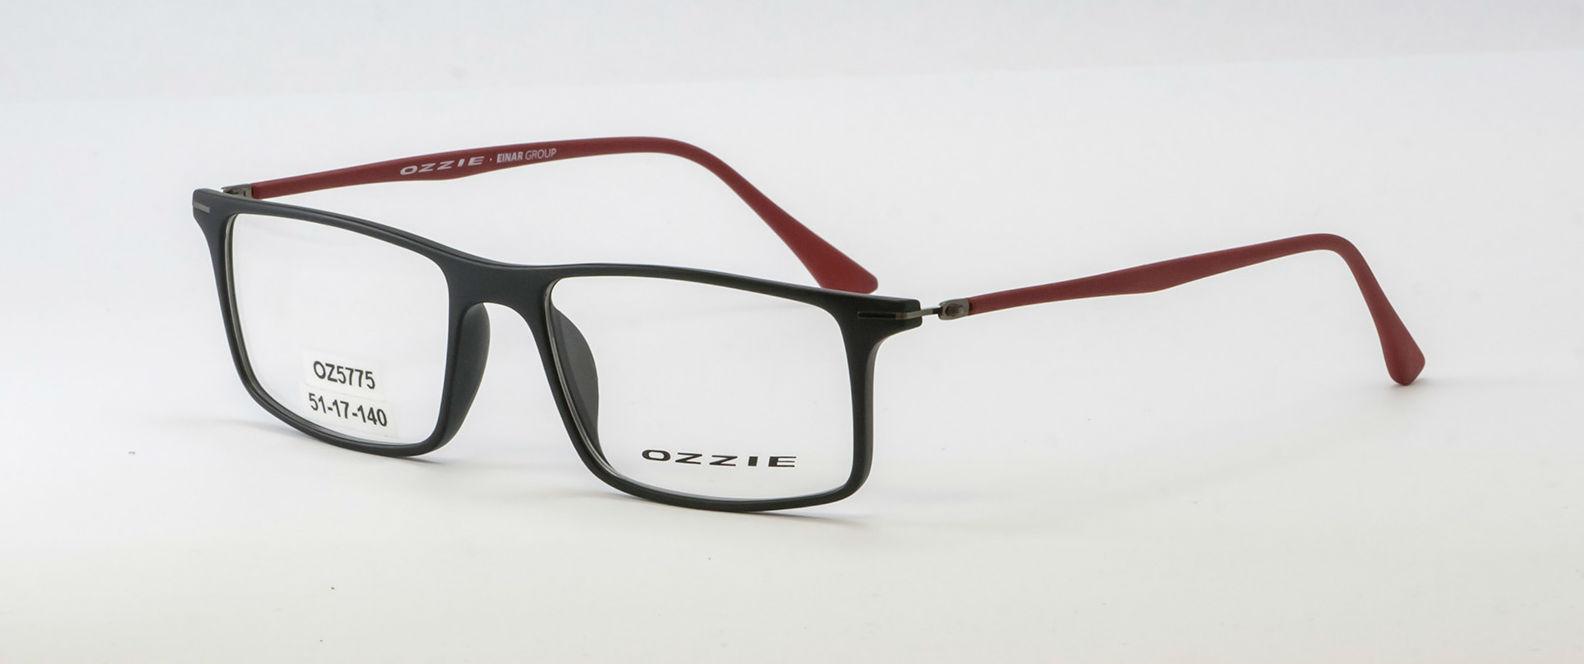 OZ5775